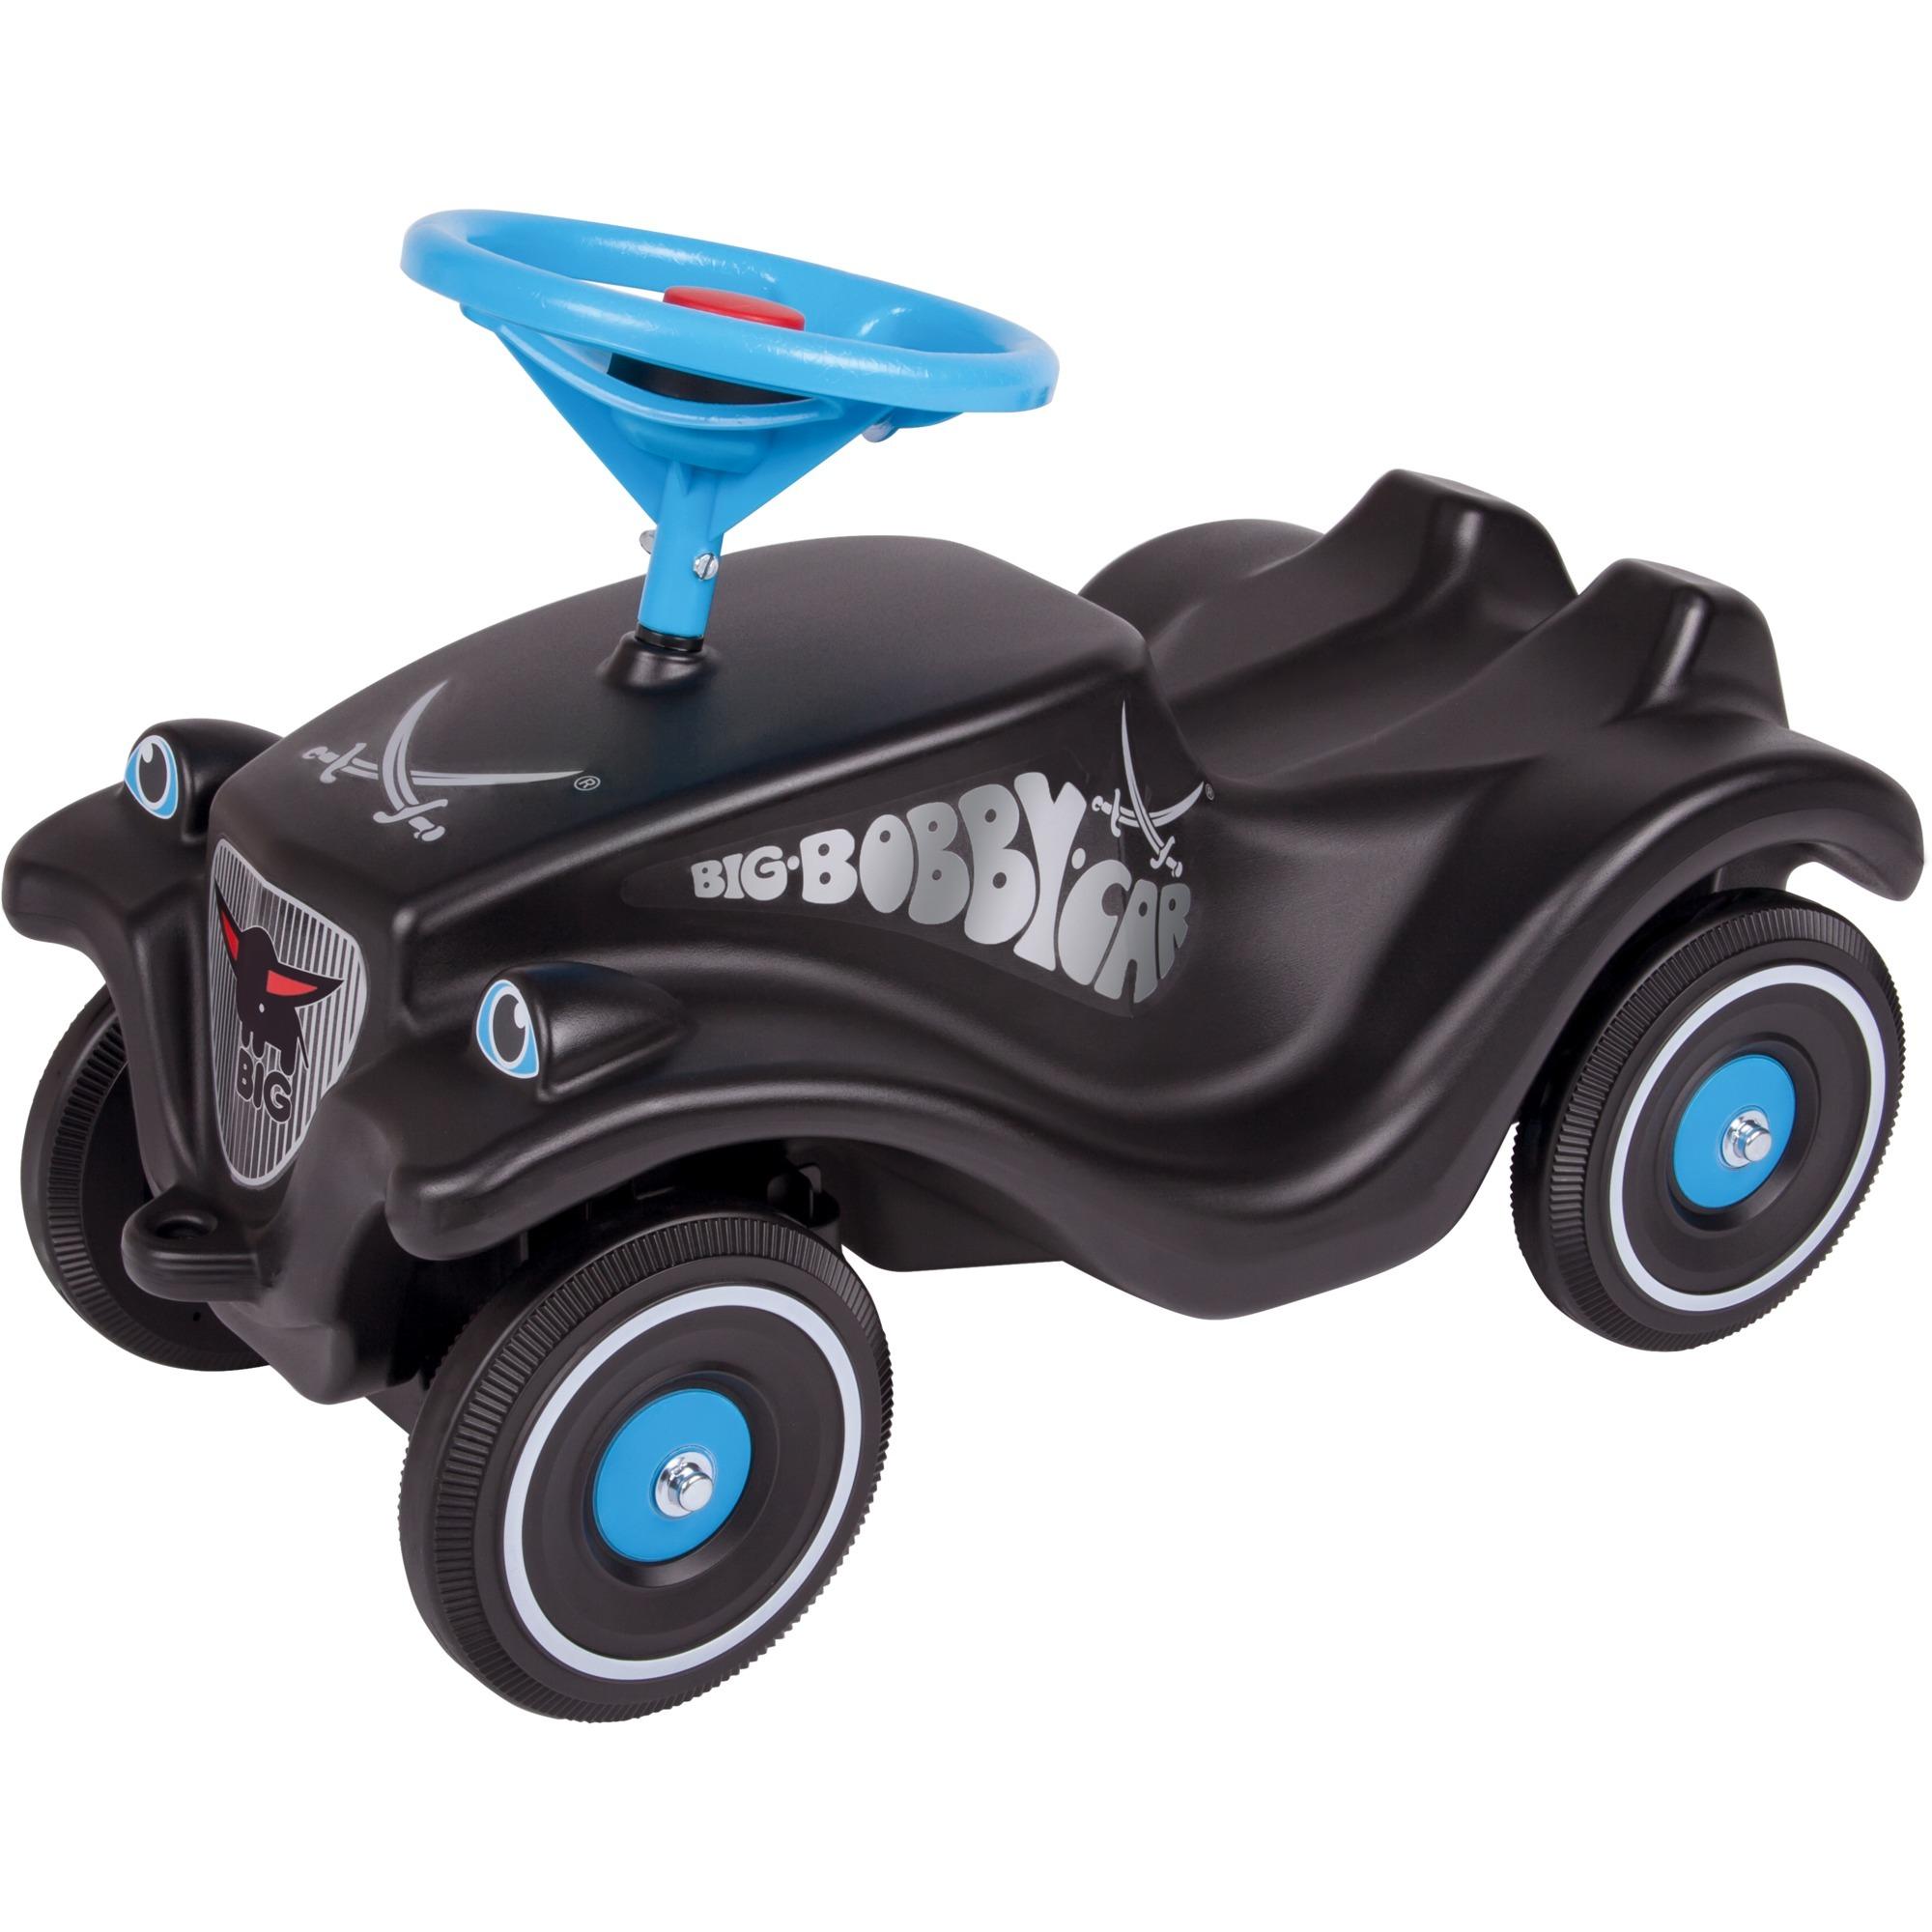 800056093 Apertura por empuje Coche juguete de montar, Automóvil de juguete